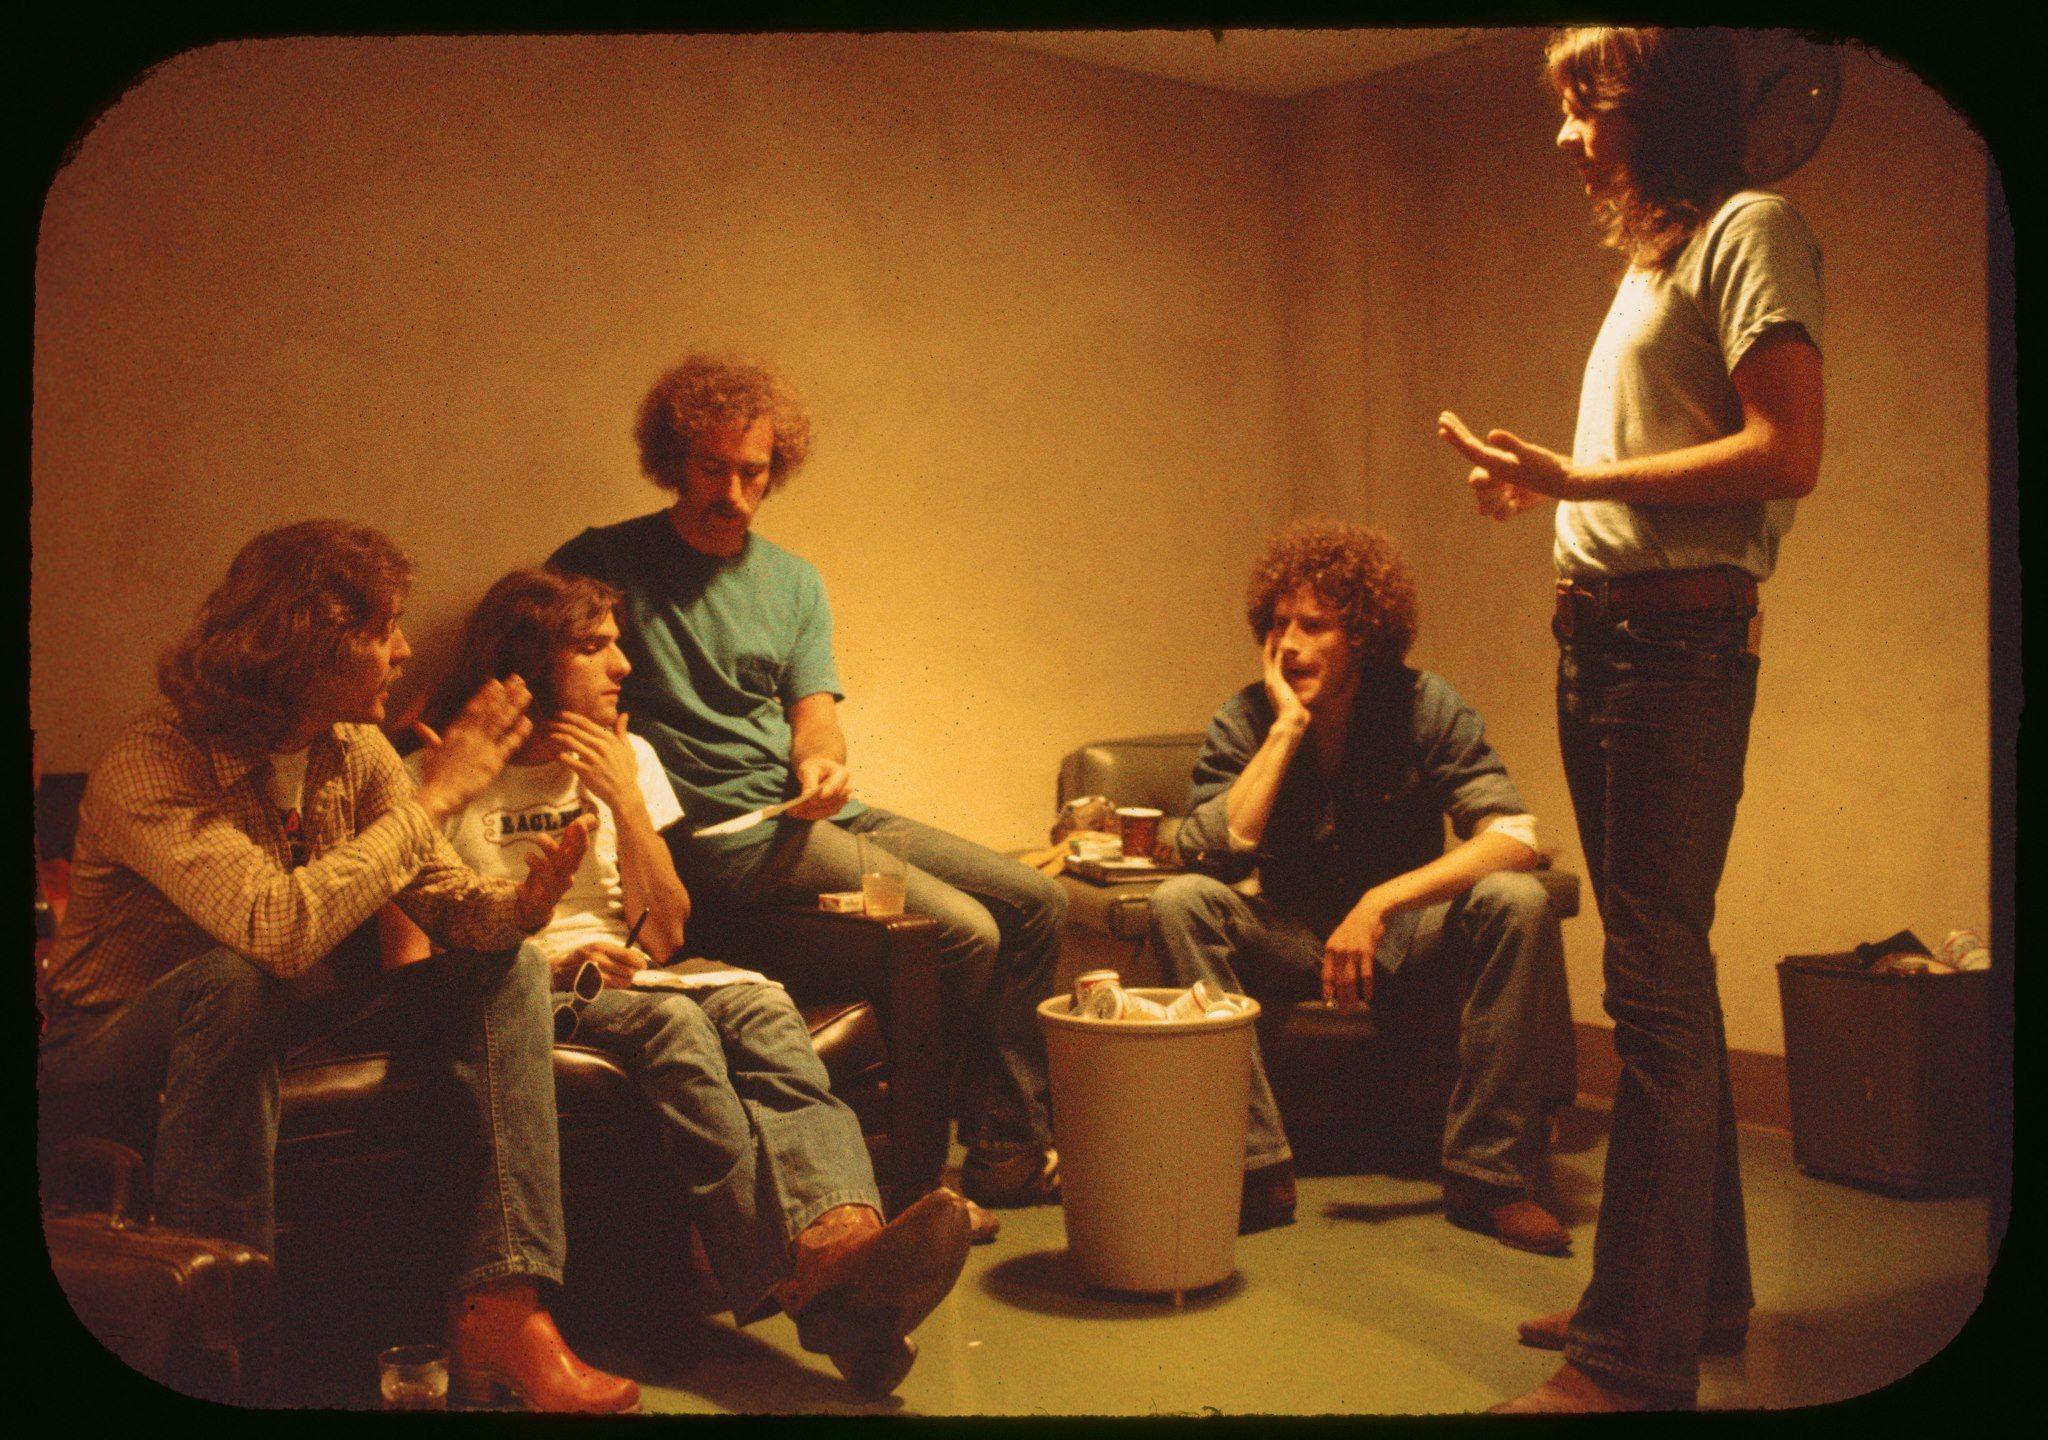 Eagles (band) | The Eagles | Pinterest